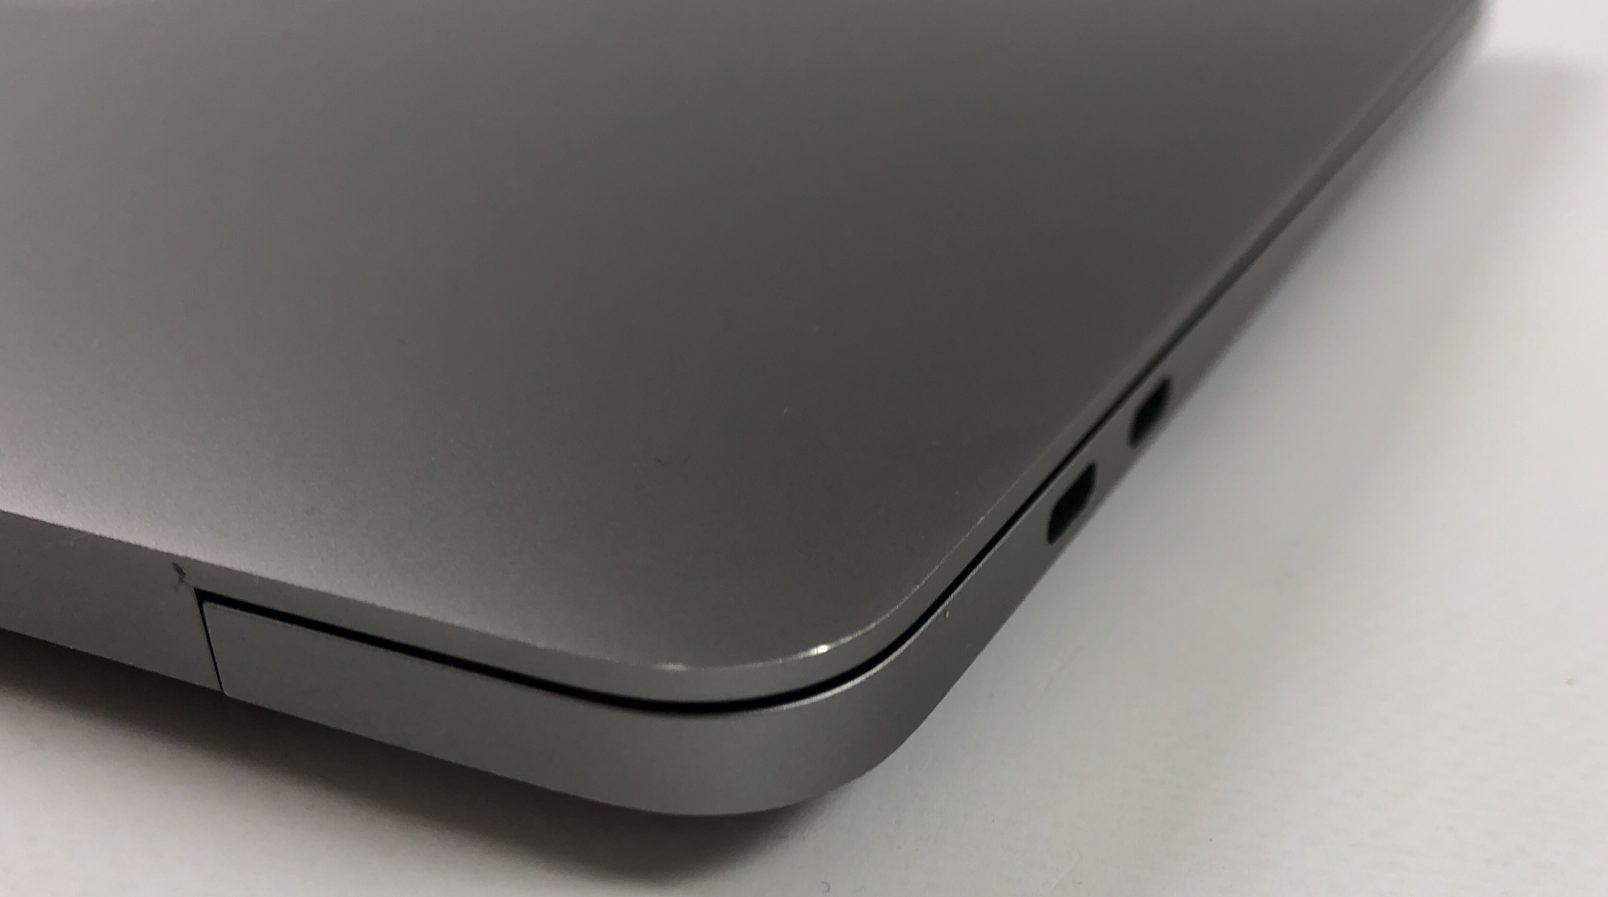 "MacBook Pro 13"" 4TBT Late 2016 (Intel Core i5 2.9 GHz 8 GB RAM 256 GB SSD), Space Gray, Intel Core i5 2.9 GHz, 8 GB RAM, 256 GB SSD, Kuva 3"